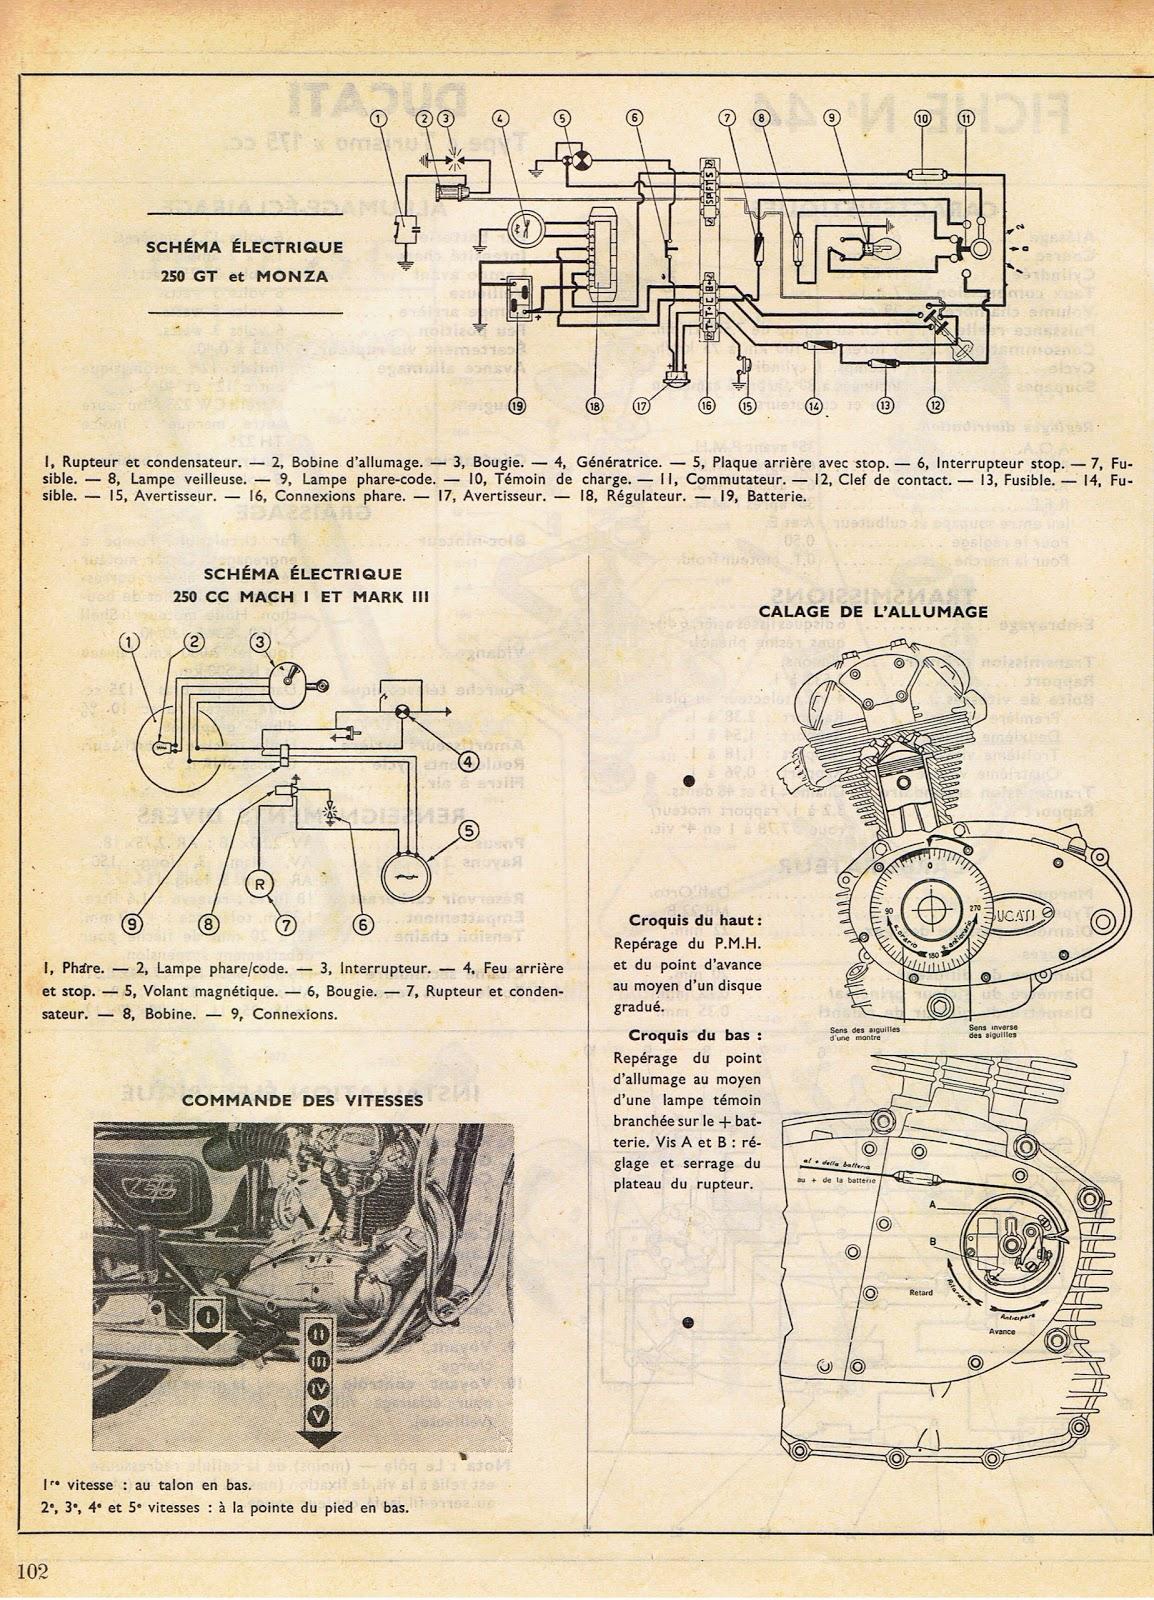 motocycles oldies passion ducati 250 cc 5 vitesses arbre cames en t te type 250 gt. Black Bedroom Furniture Sets. Home Design Ideas